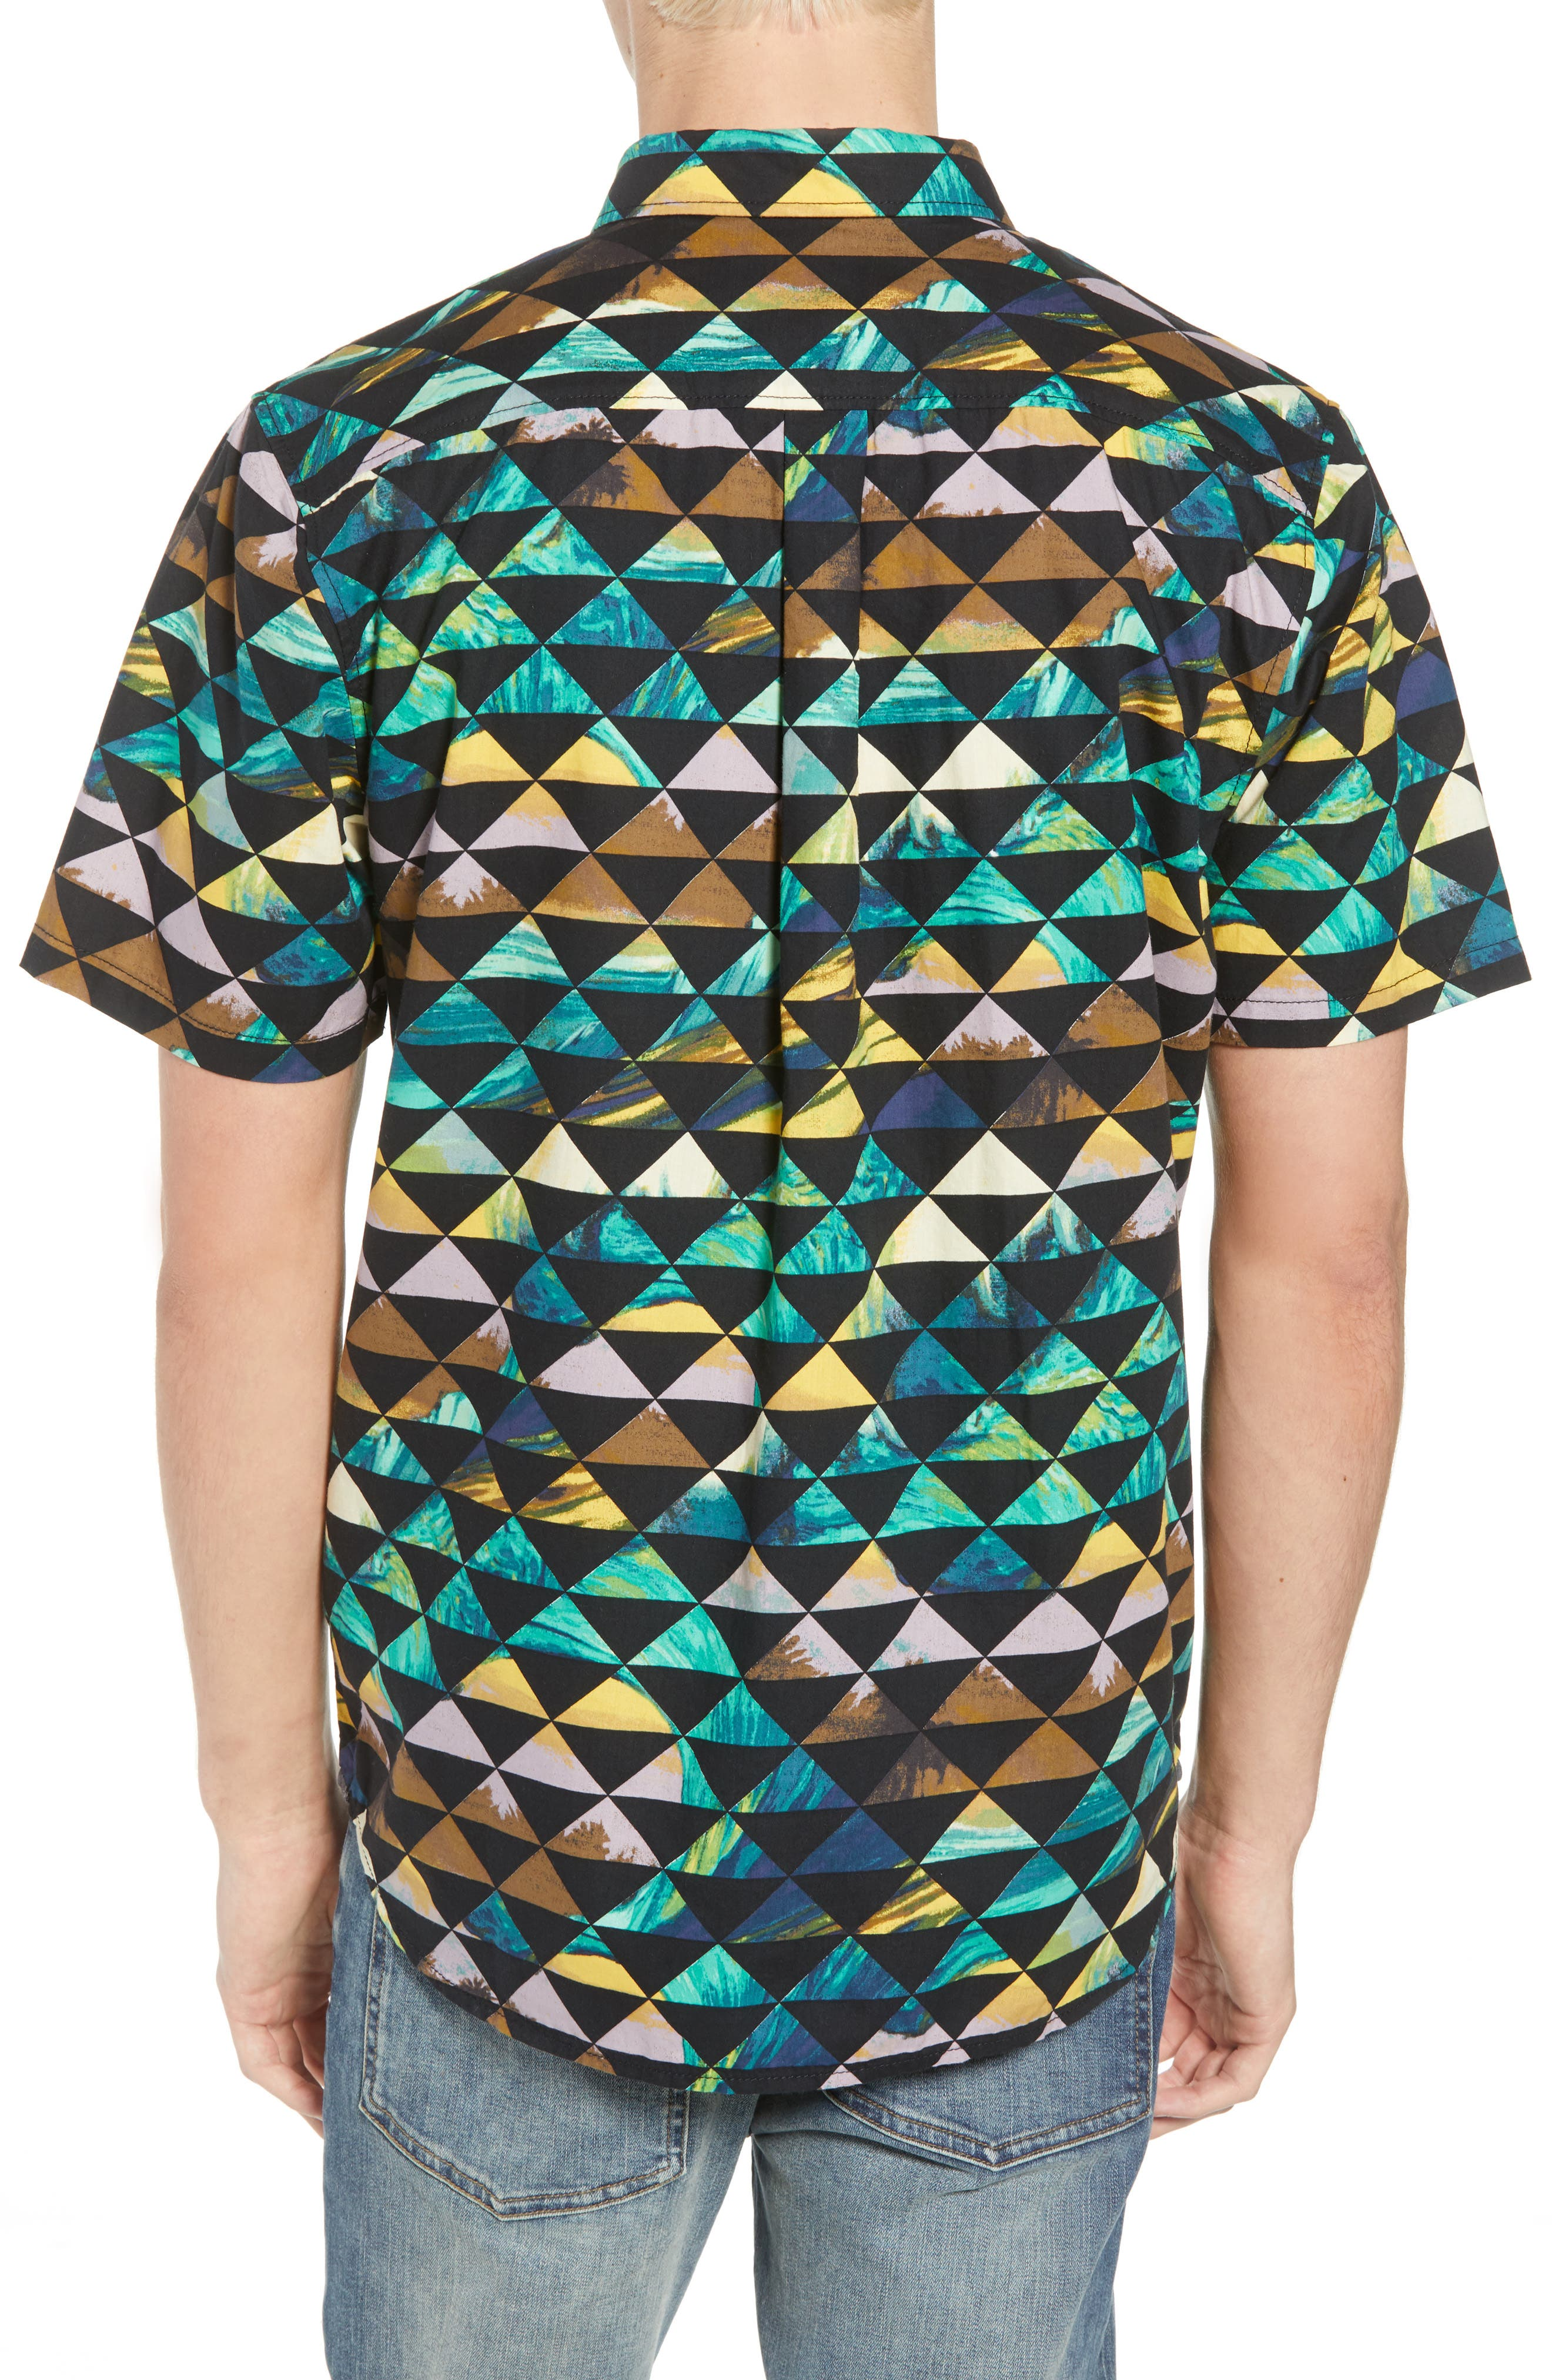 2018 VTCS Aloha Print Woven Shirt,                             Alternate thumbnail 2, color,                             001